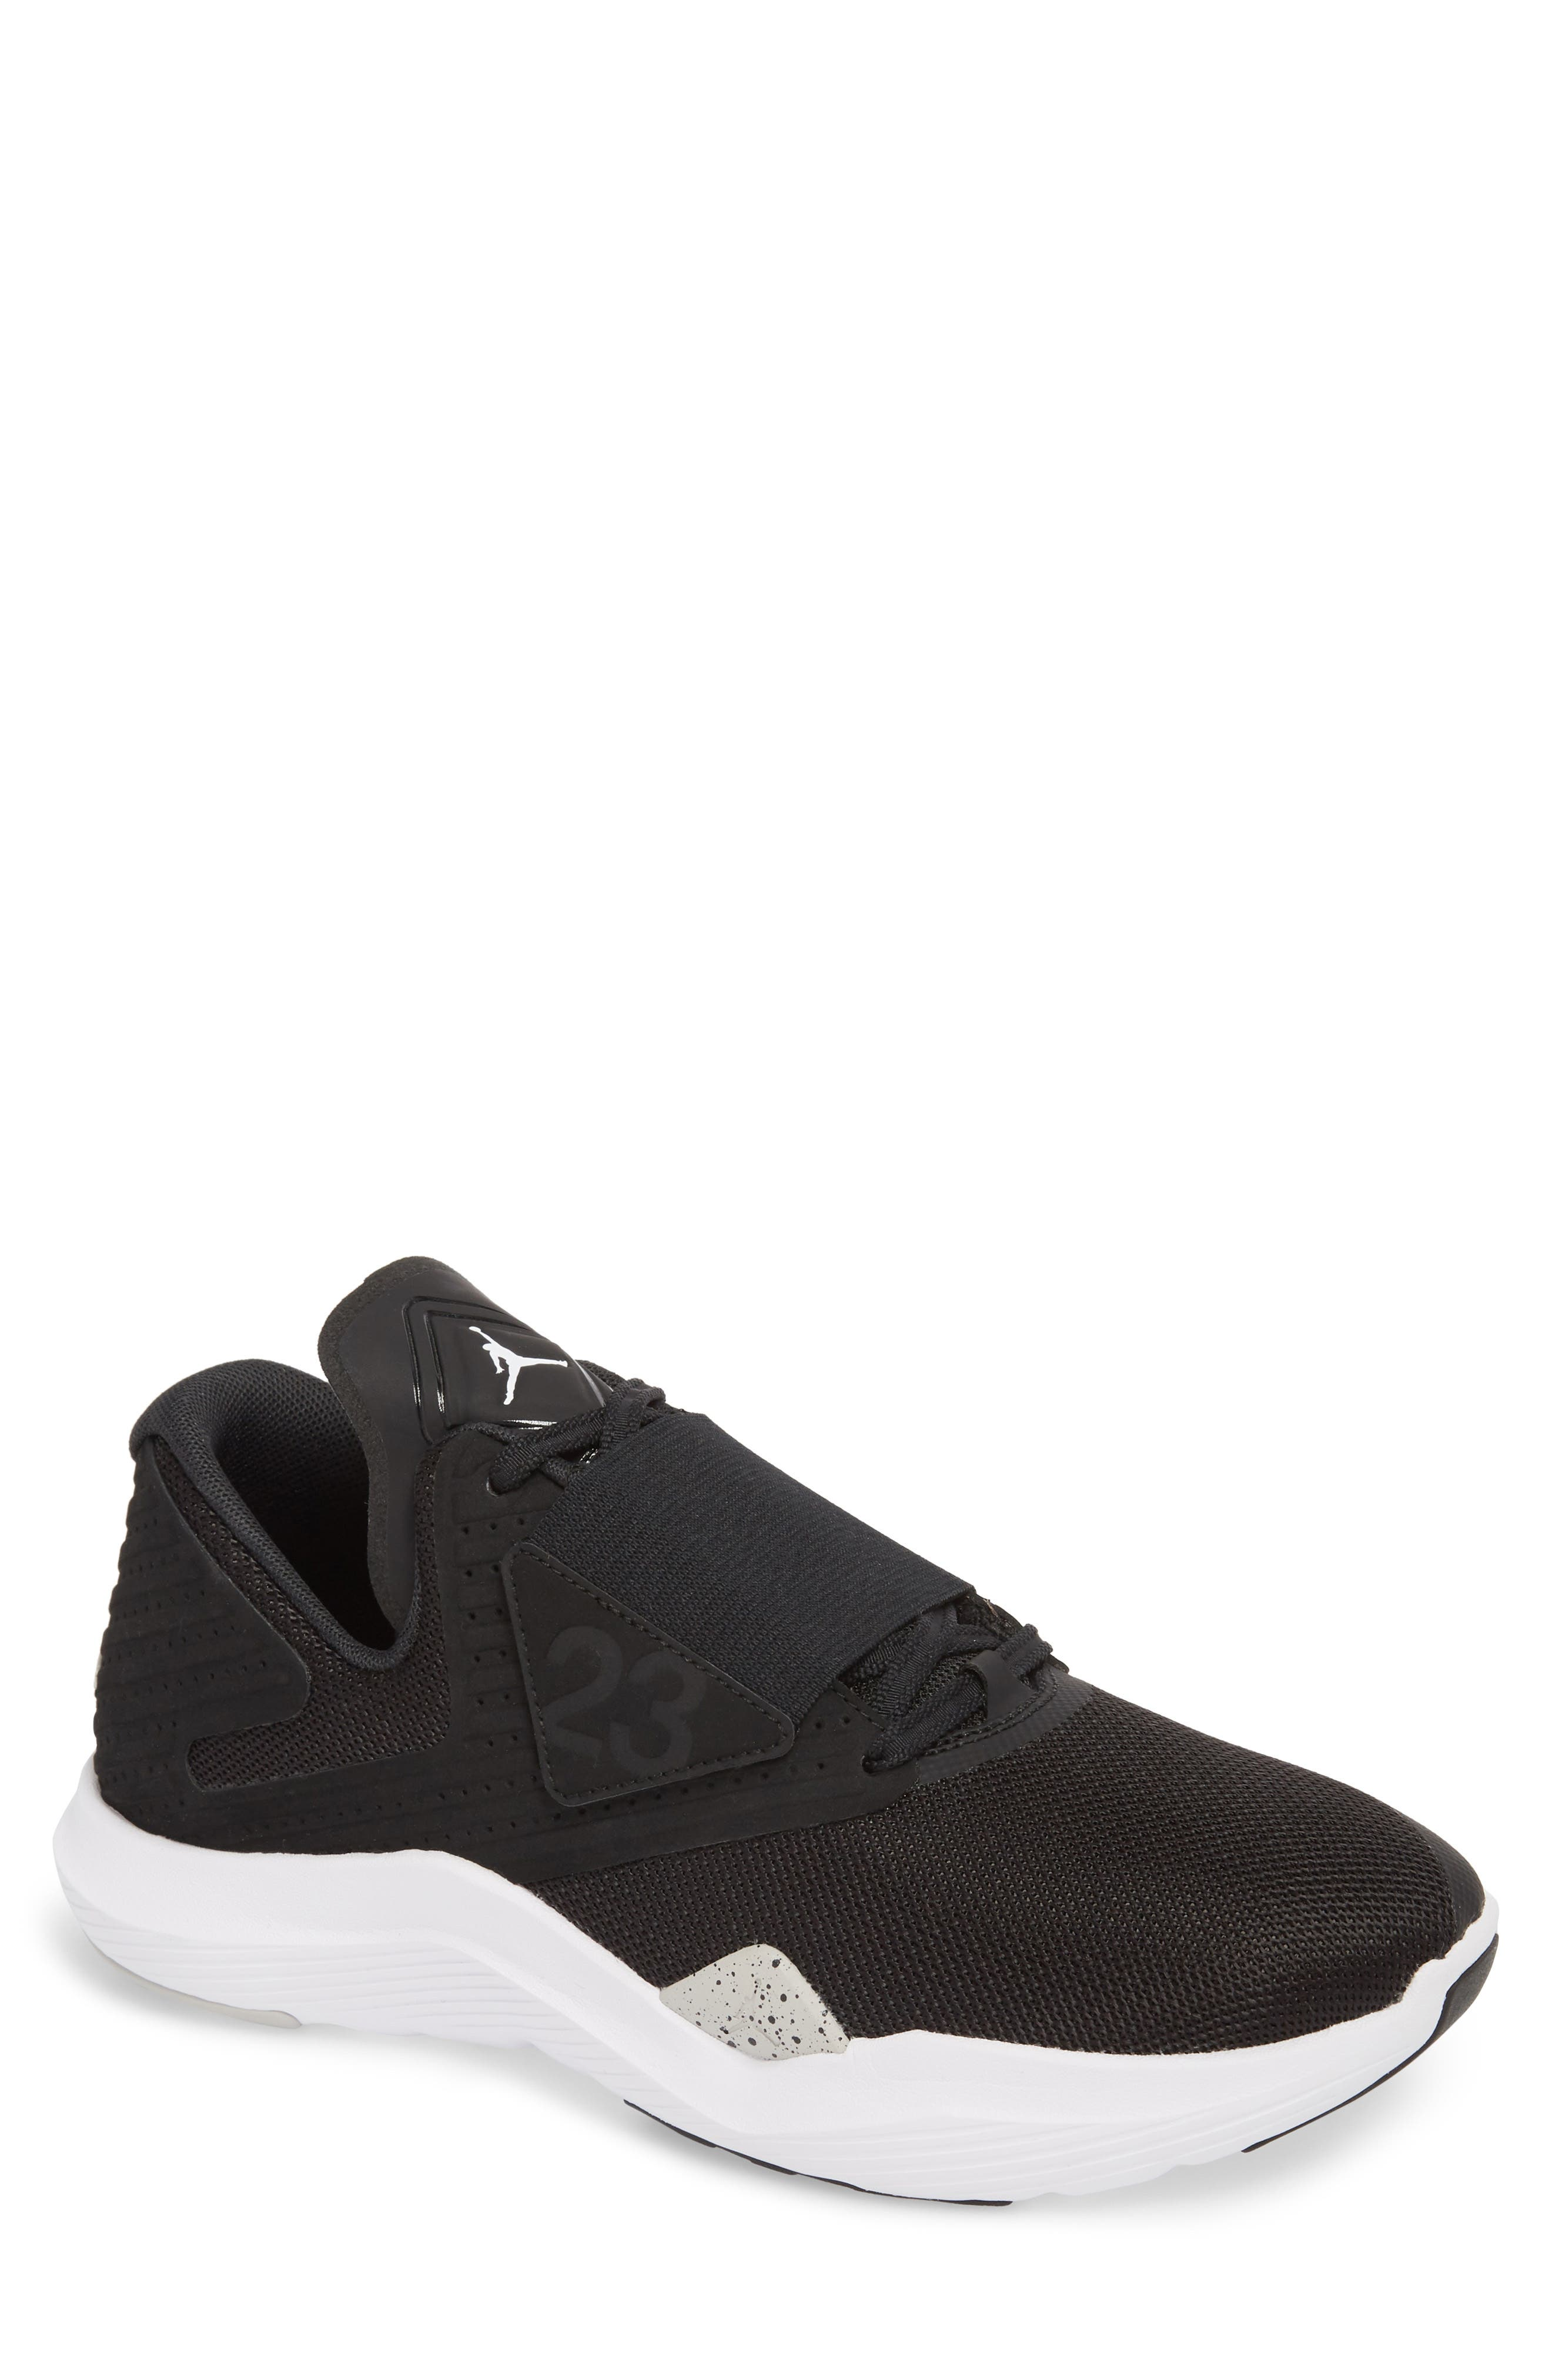 Air Jordan Relentless Training Sneaker,                         Main,                         color, BLACK/ TECH GREY/ WHITE